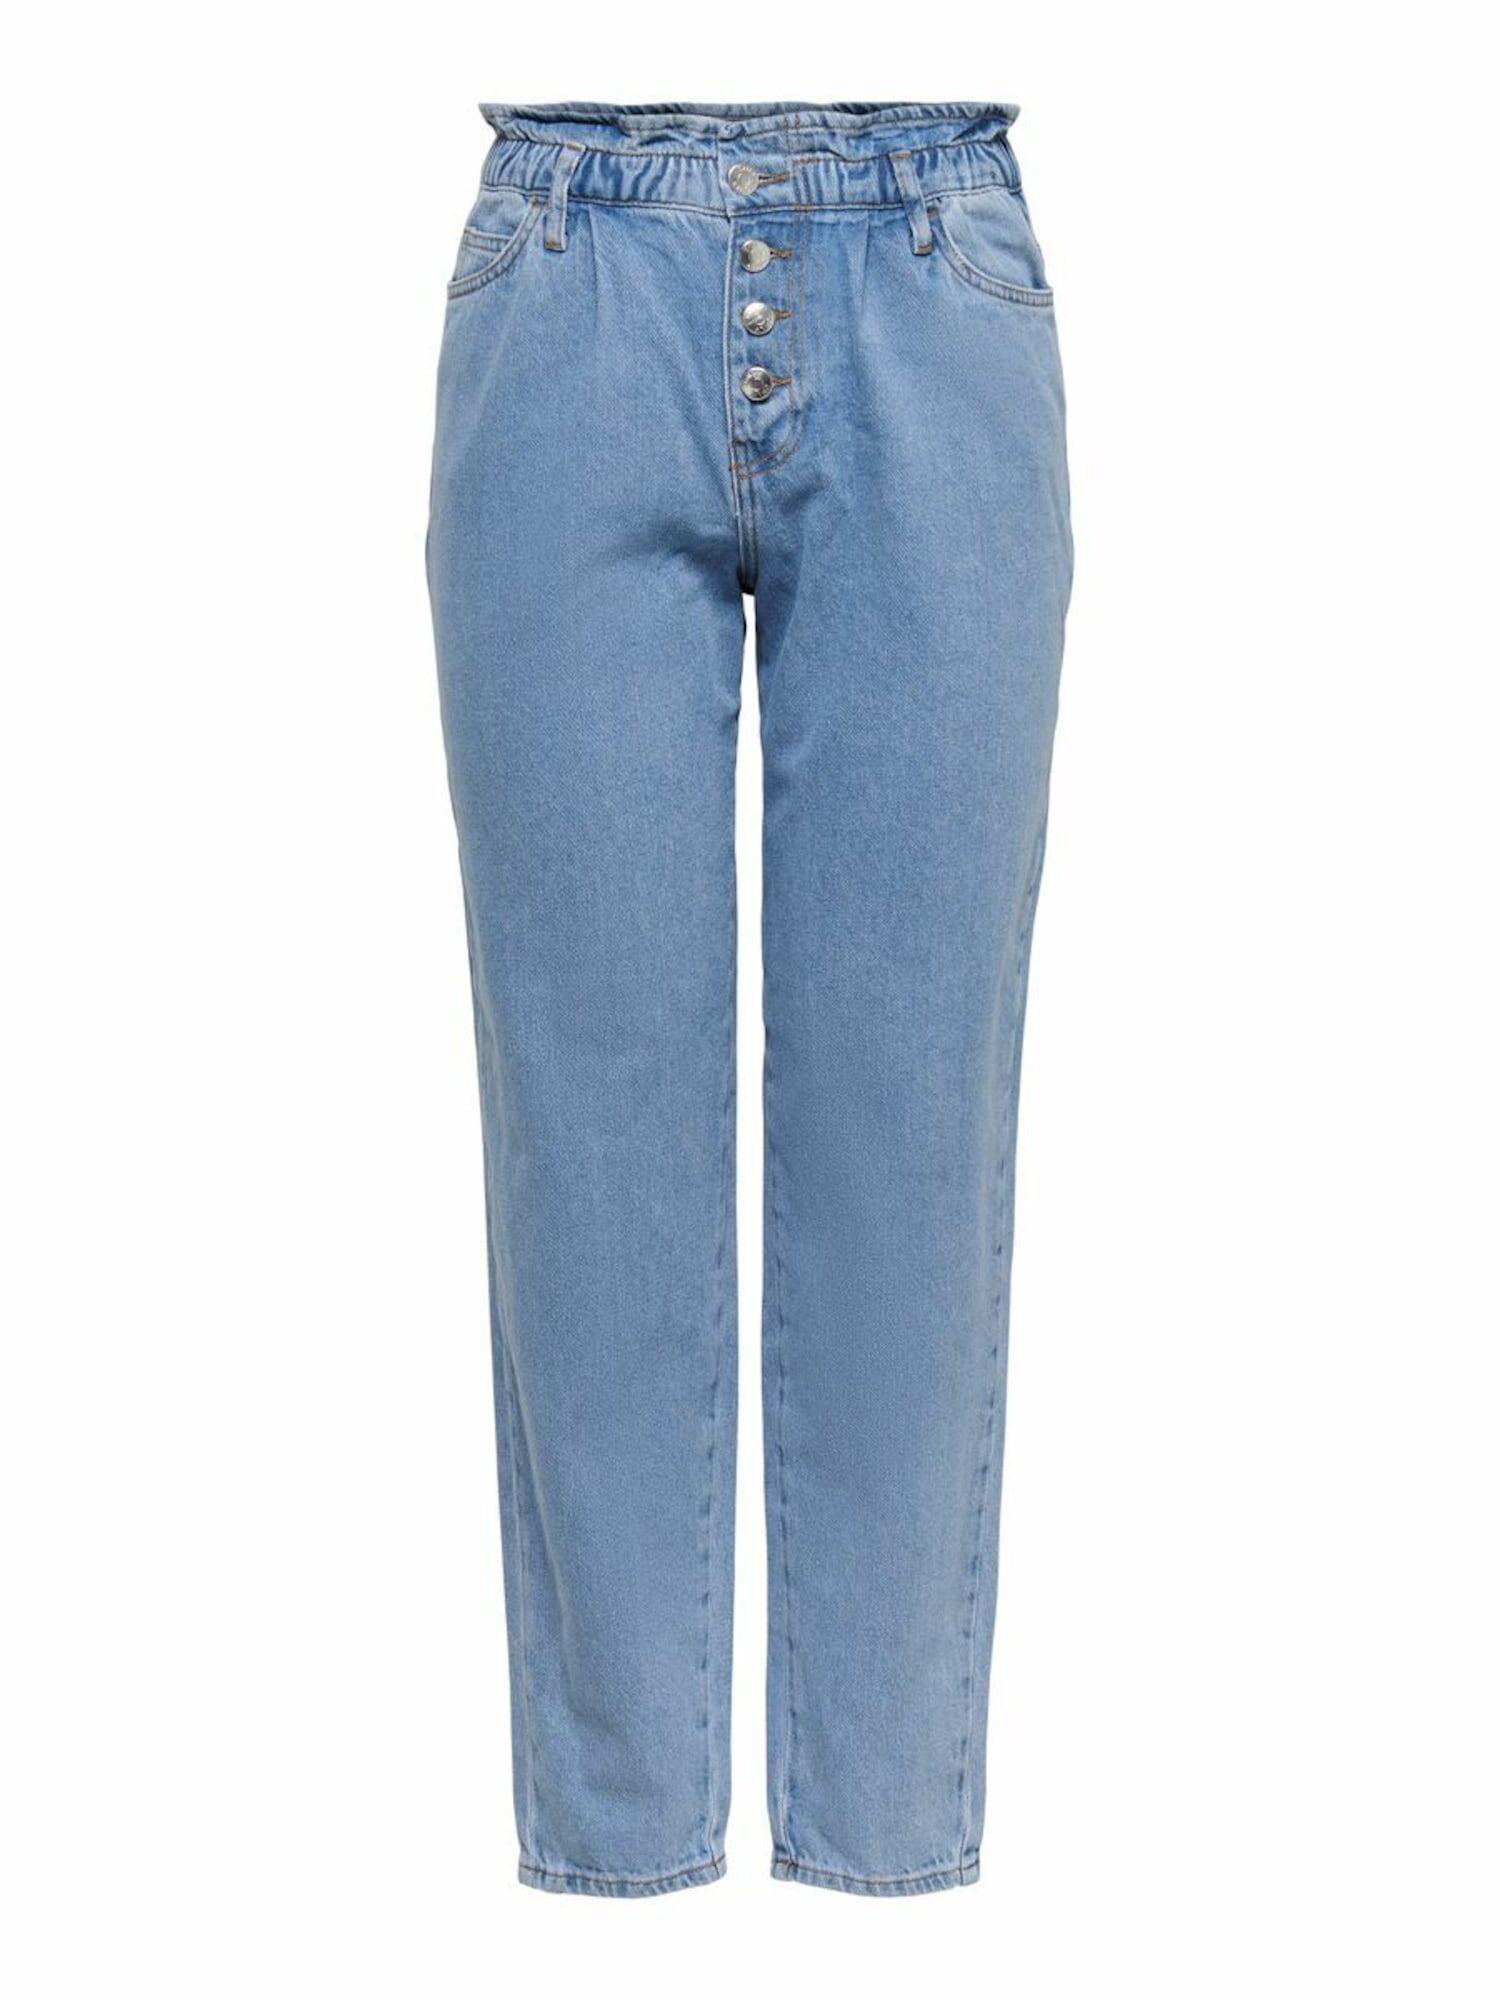 ONLY Jean à pince 'CUBA'  - Bleu - Taille: M - female